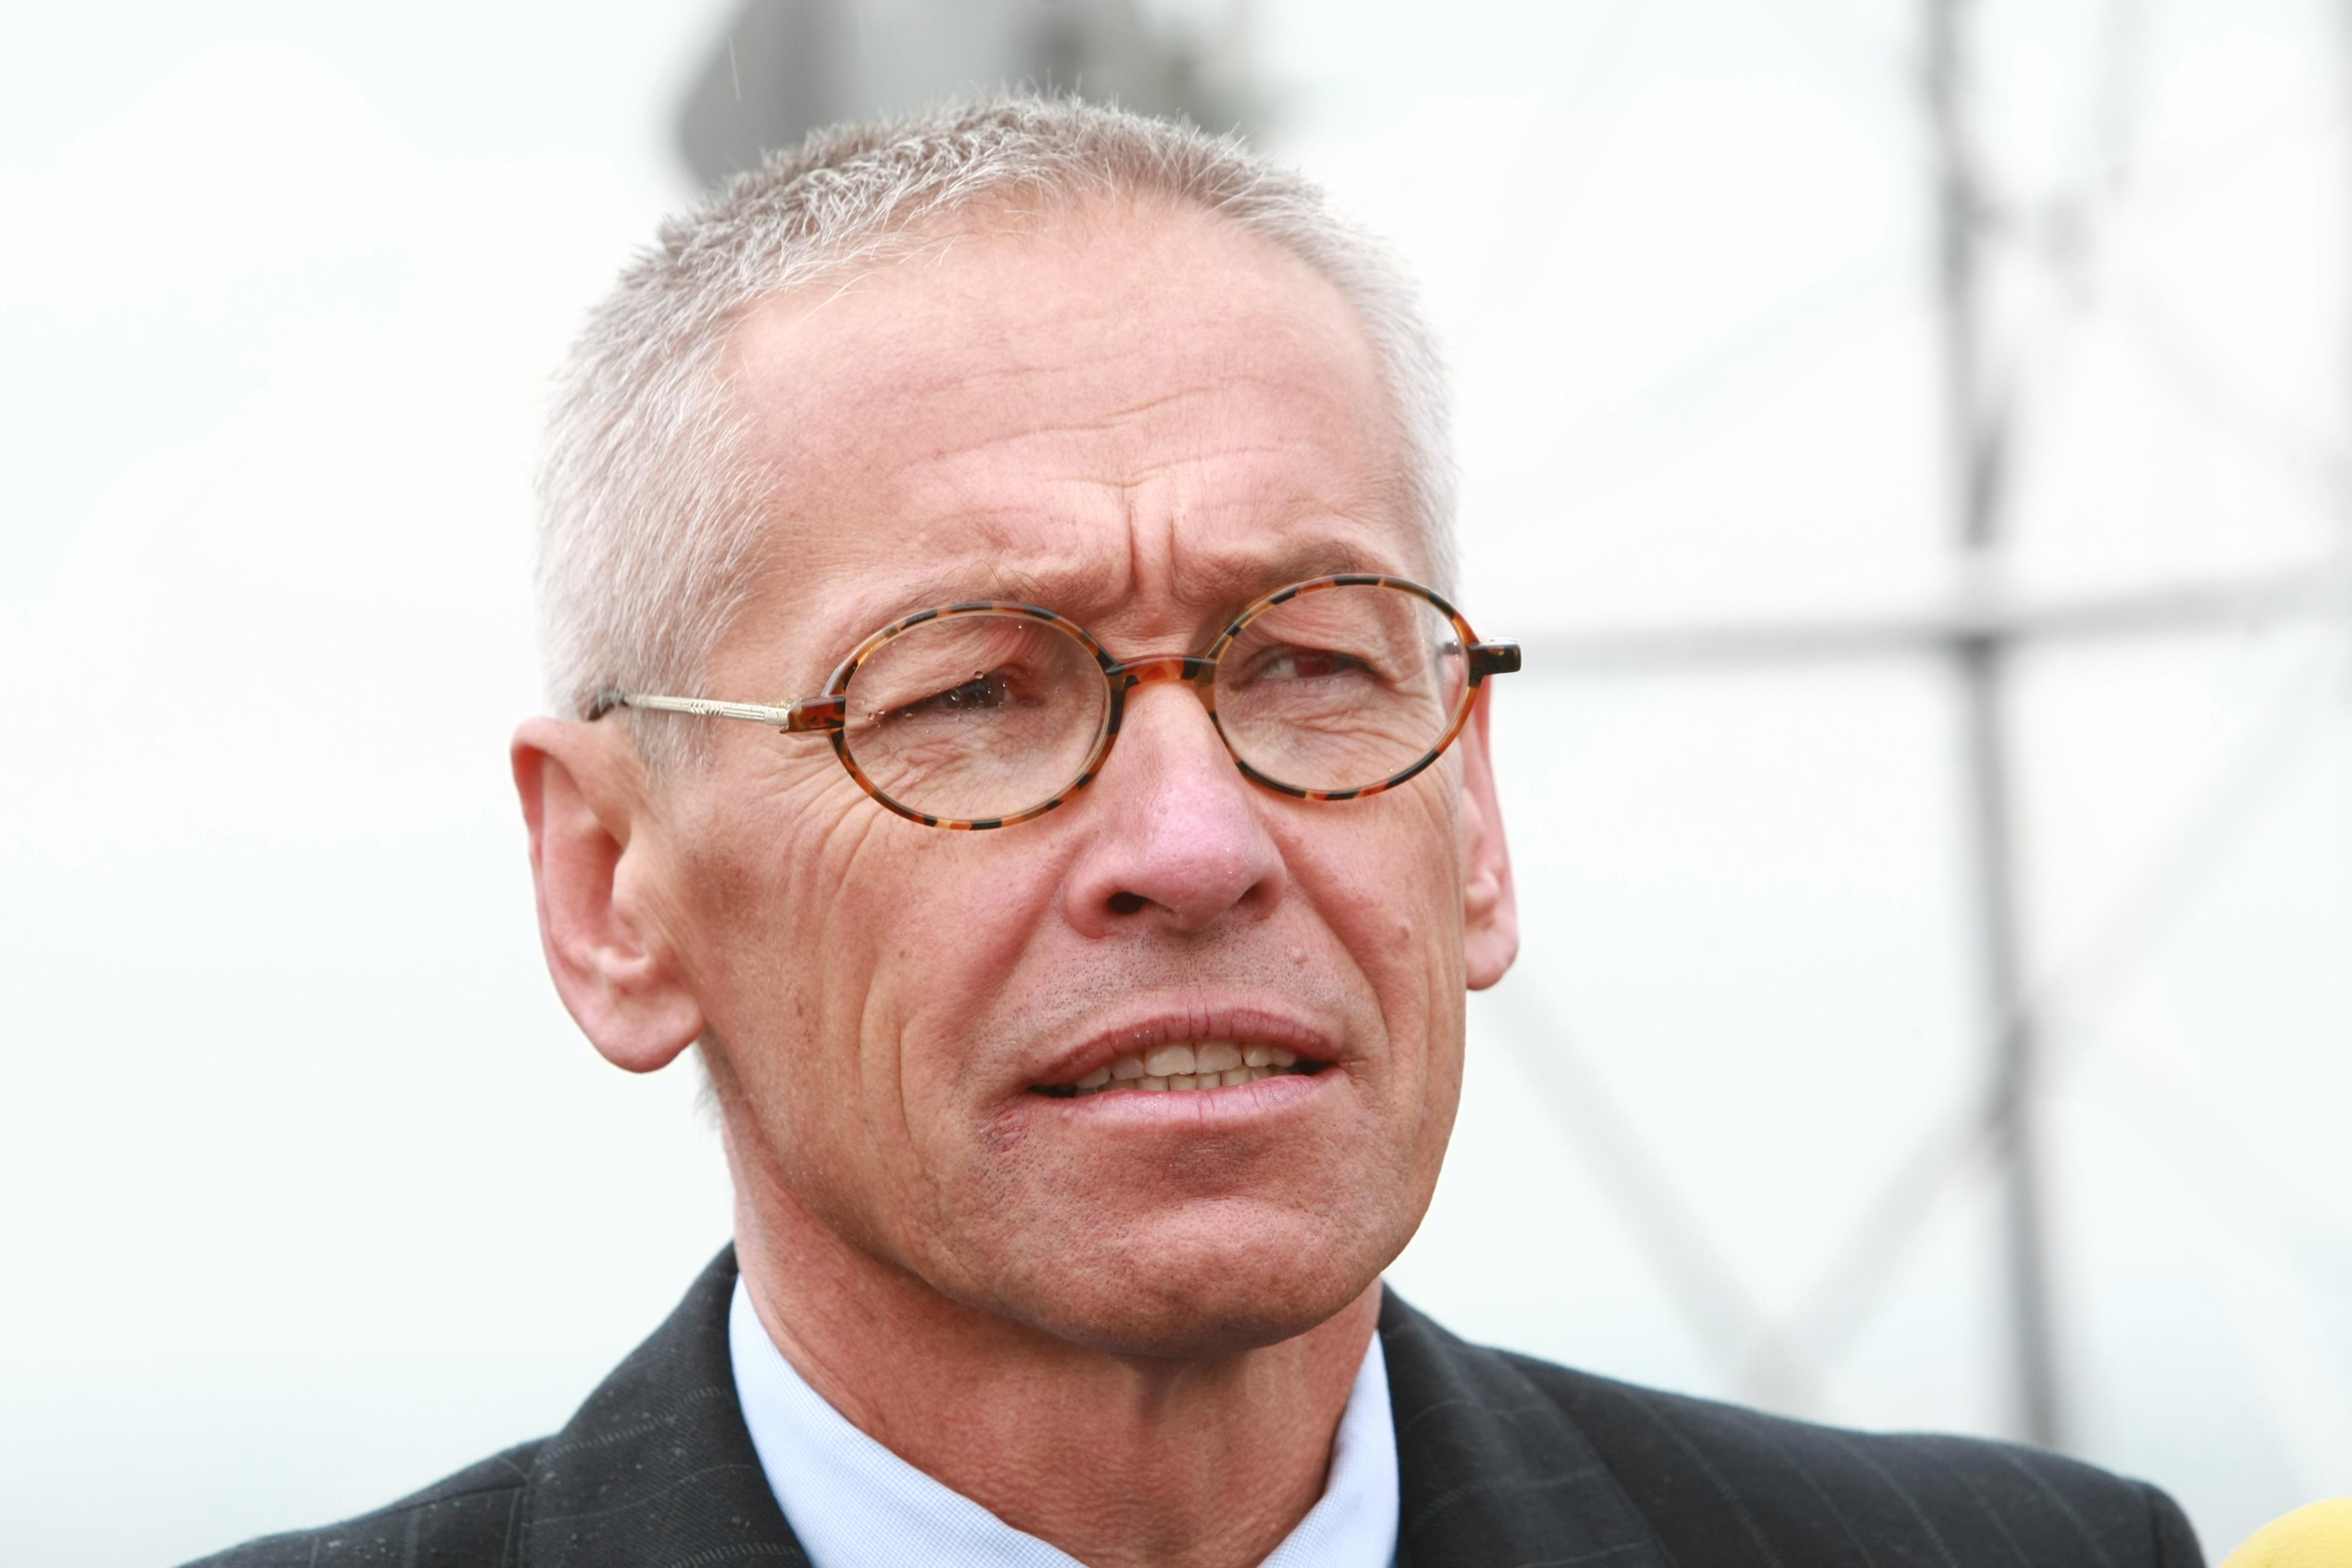 Himalaista Piotr Pustelnik (fot. Małgorzata Kujawka / Agencja Gazeta)